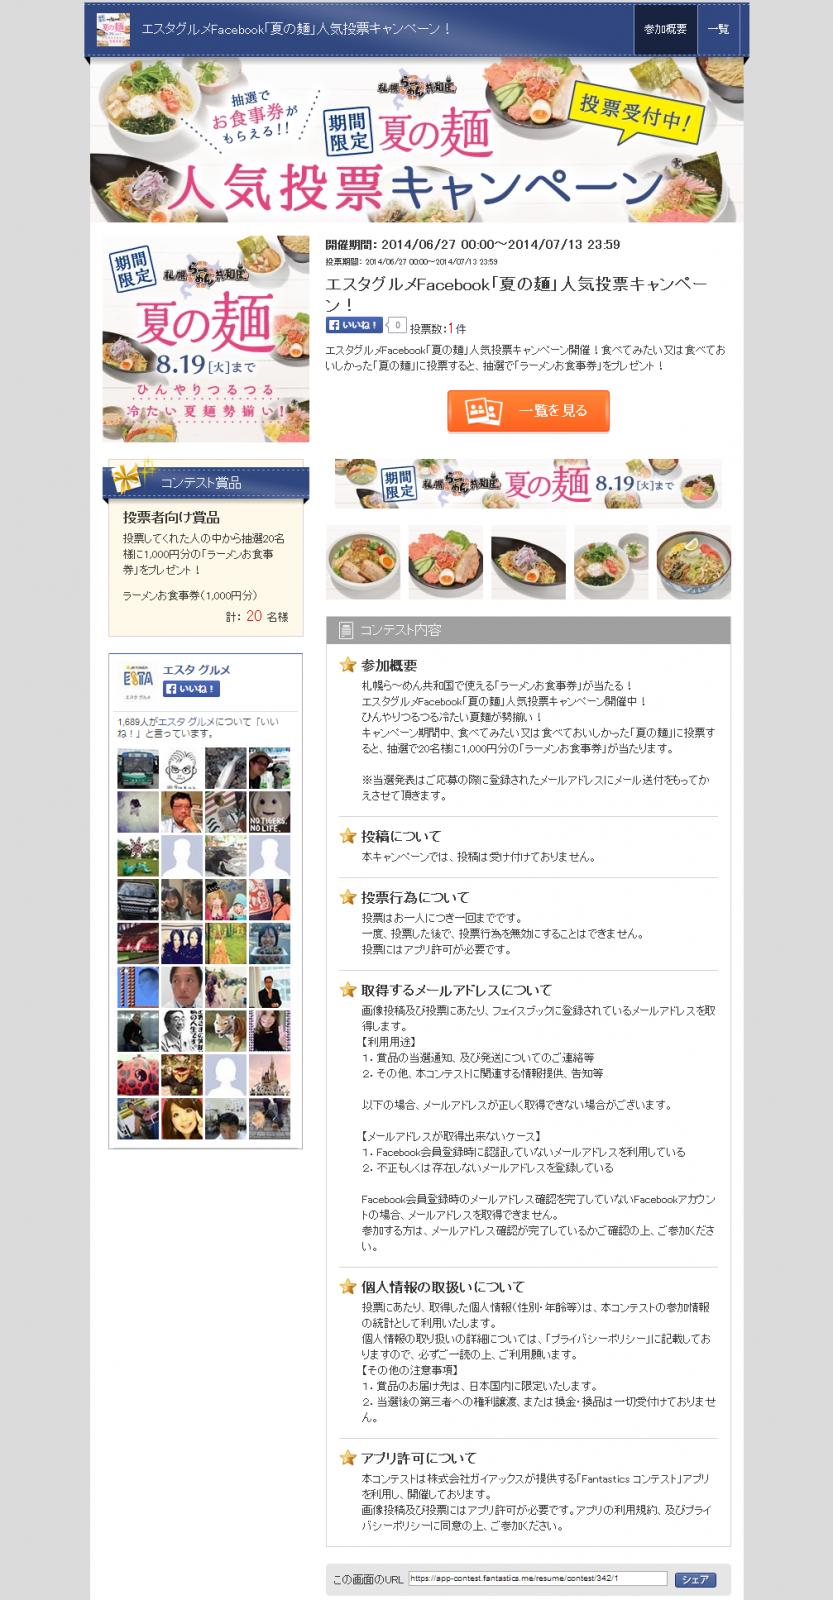 Fantastics 投票コンテスト(株式会社東急エージェンシー様)